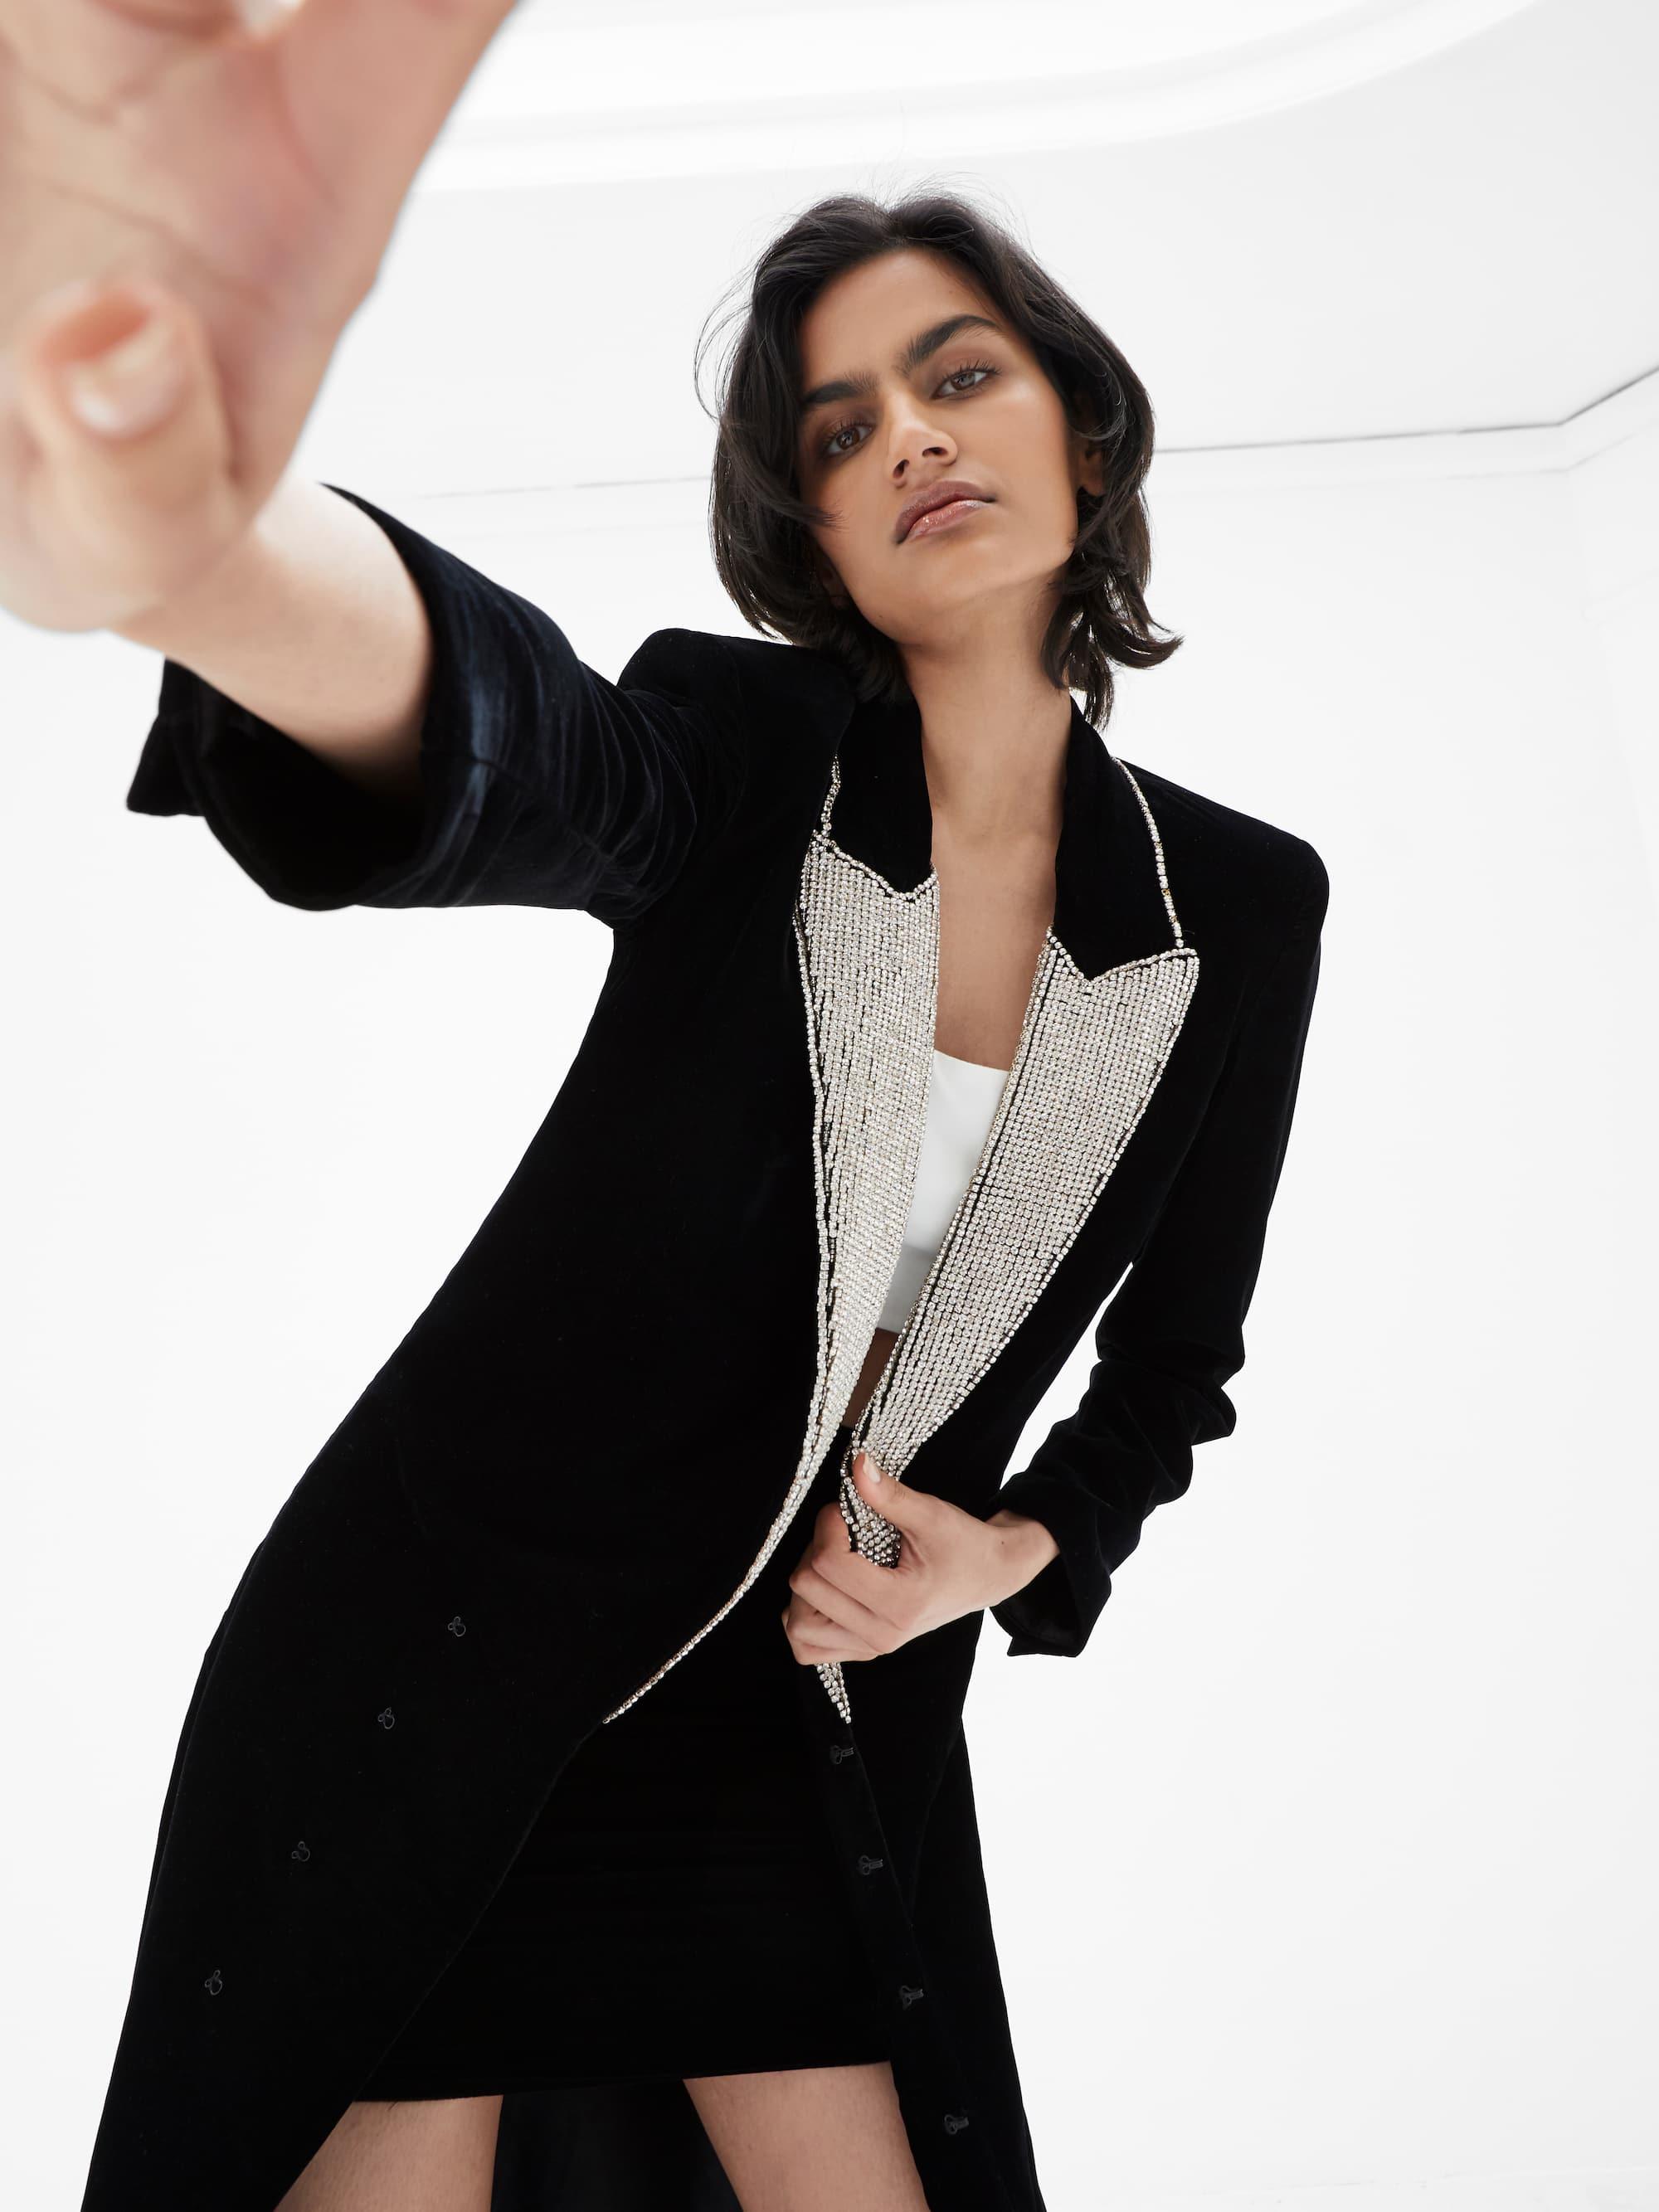 View 4 of model wearing Kalia Kimono in black.